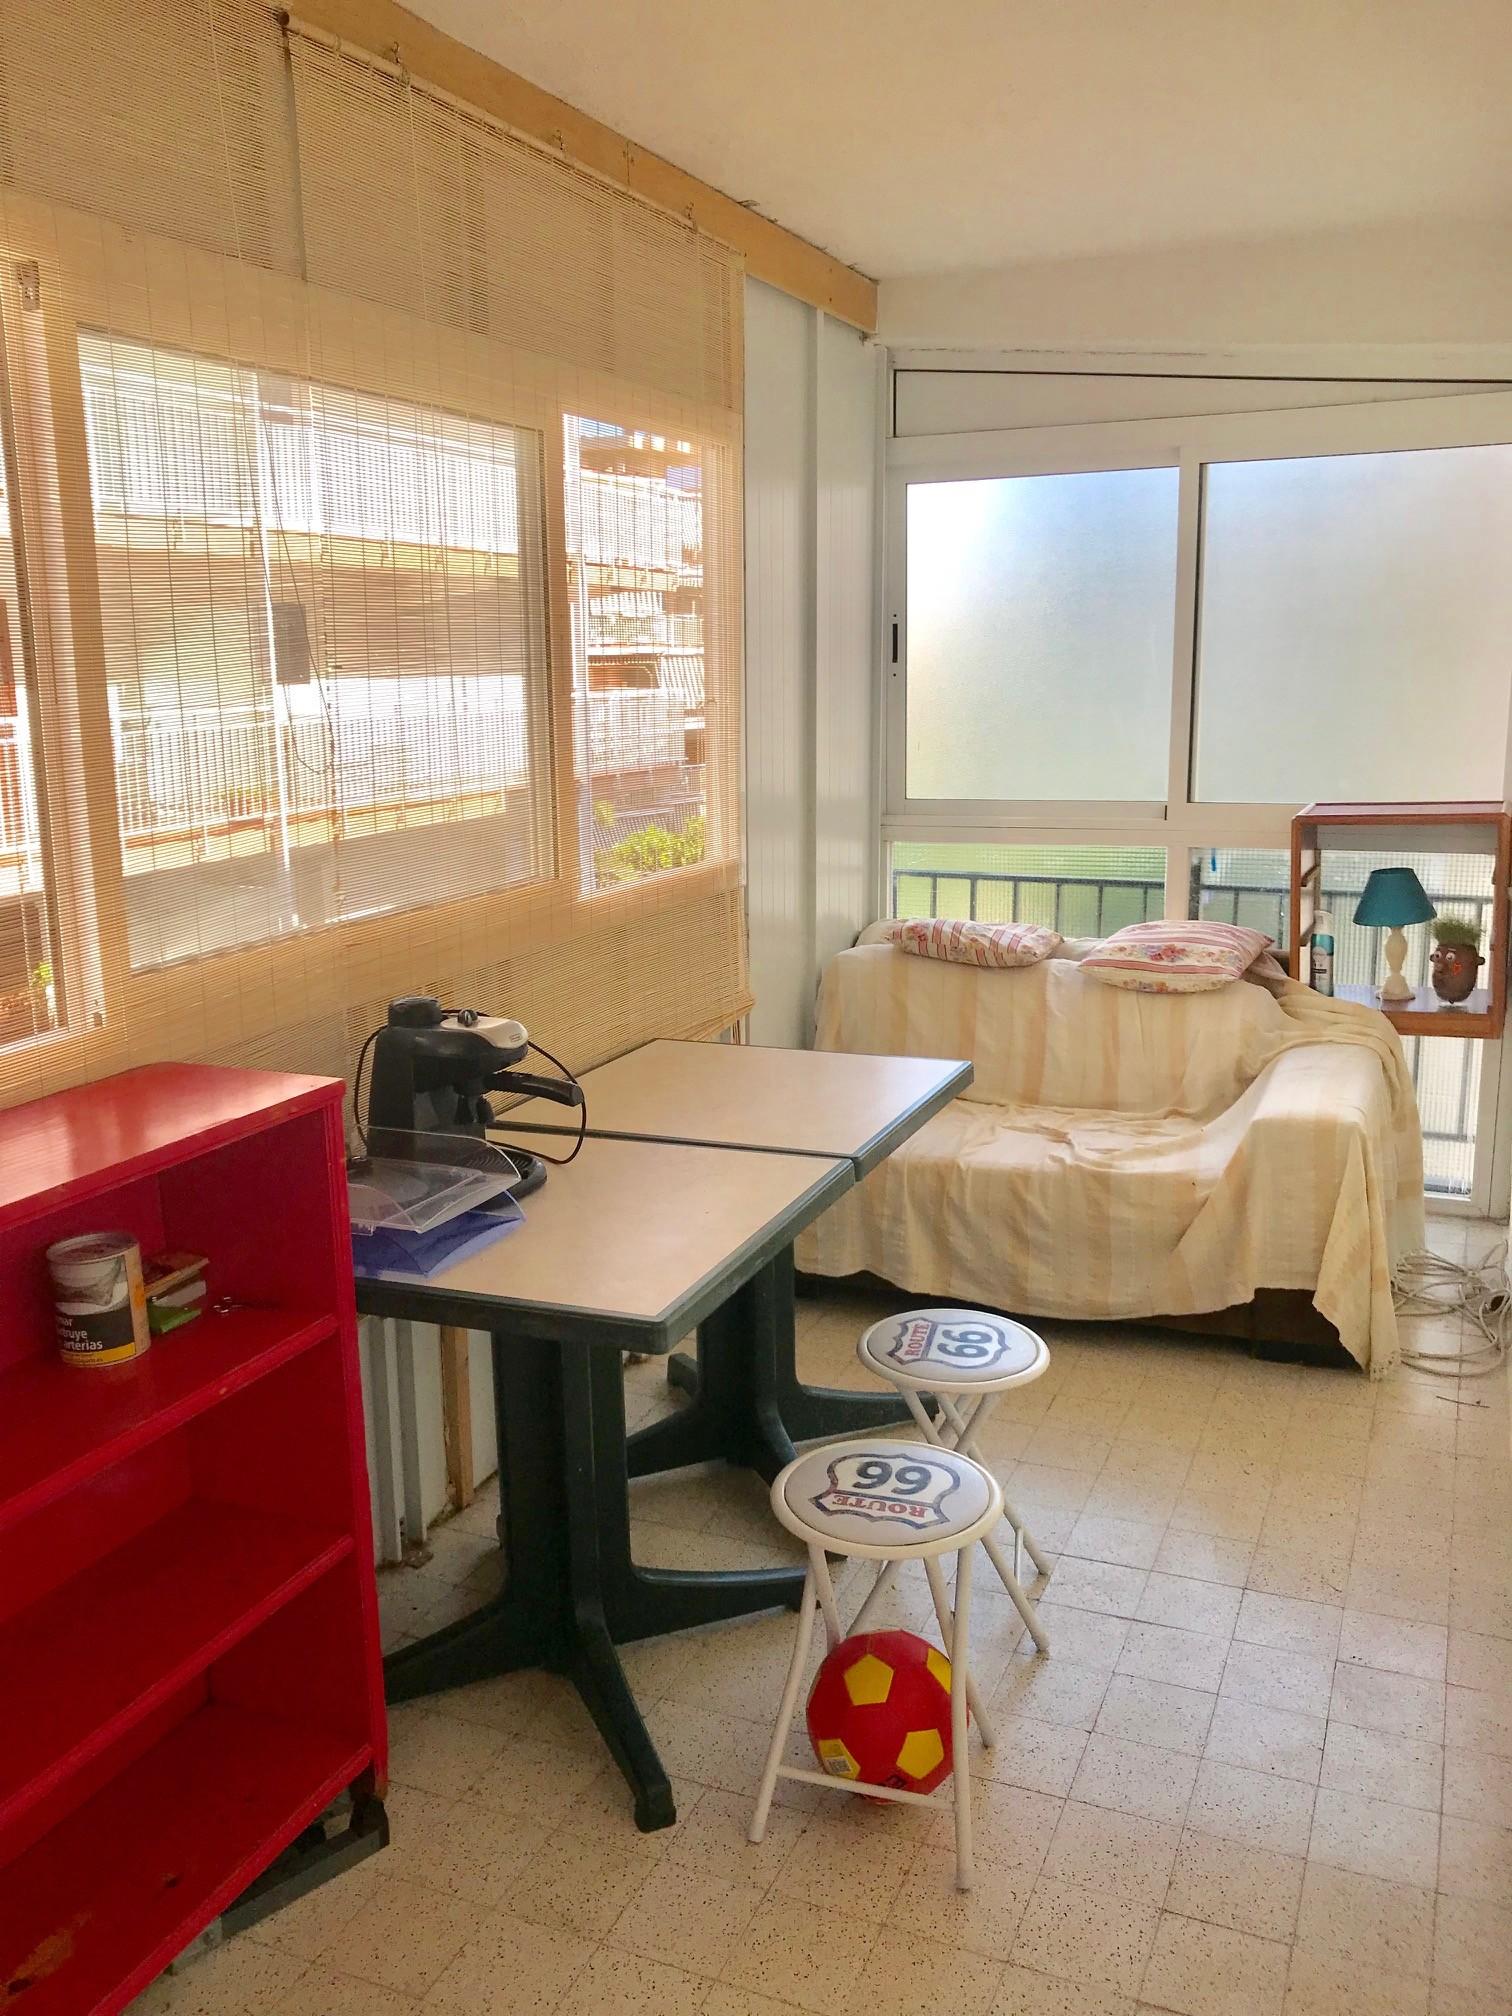 Brasilia, camas en mini residencia estudiantes